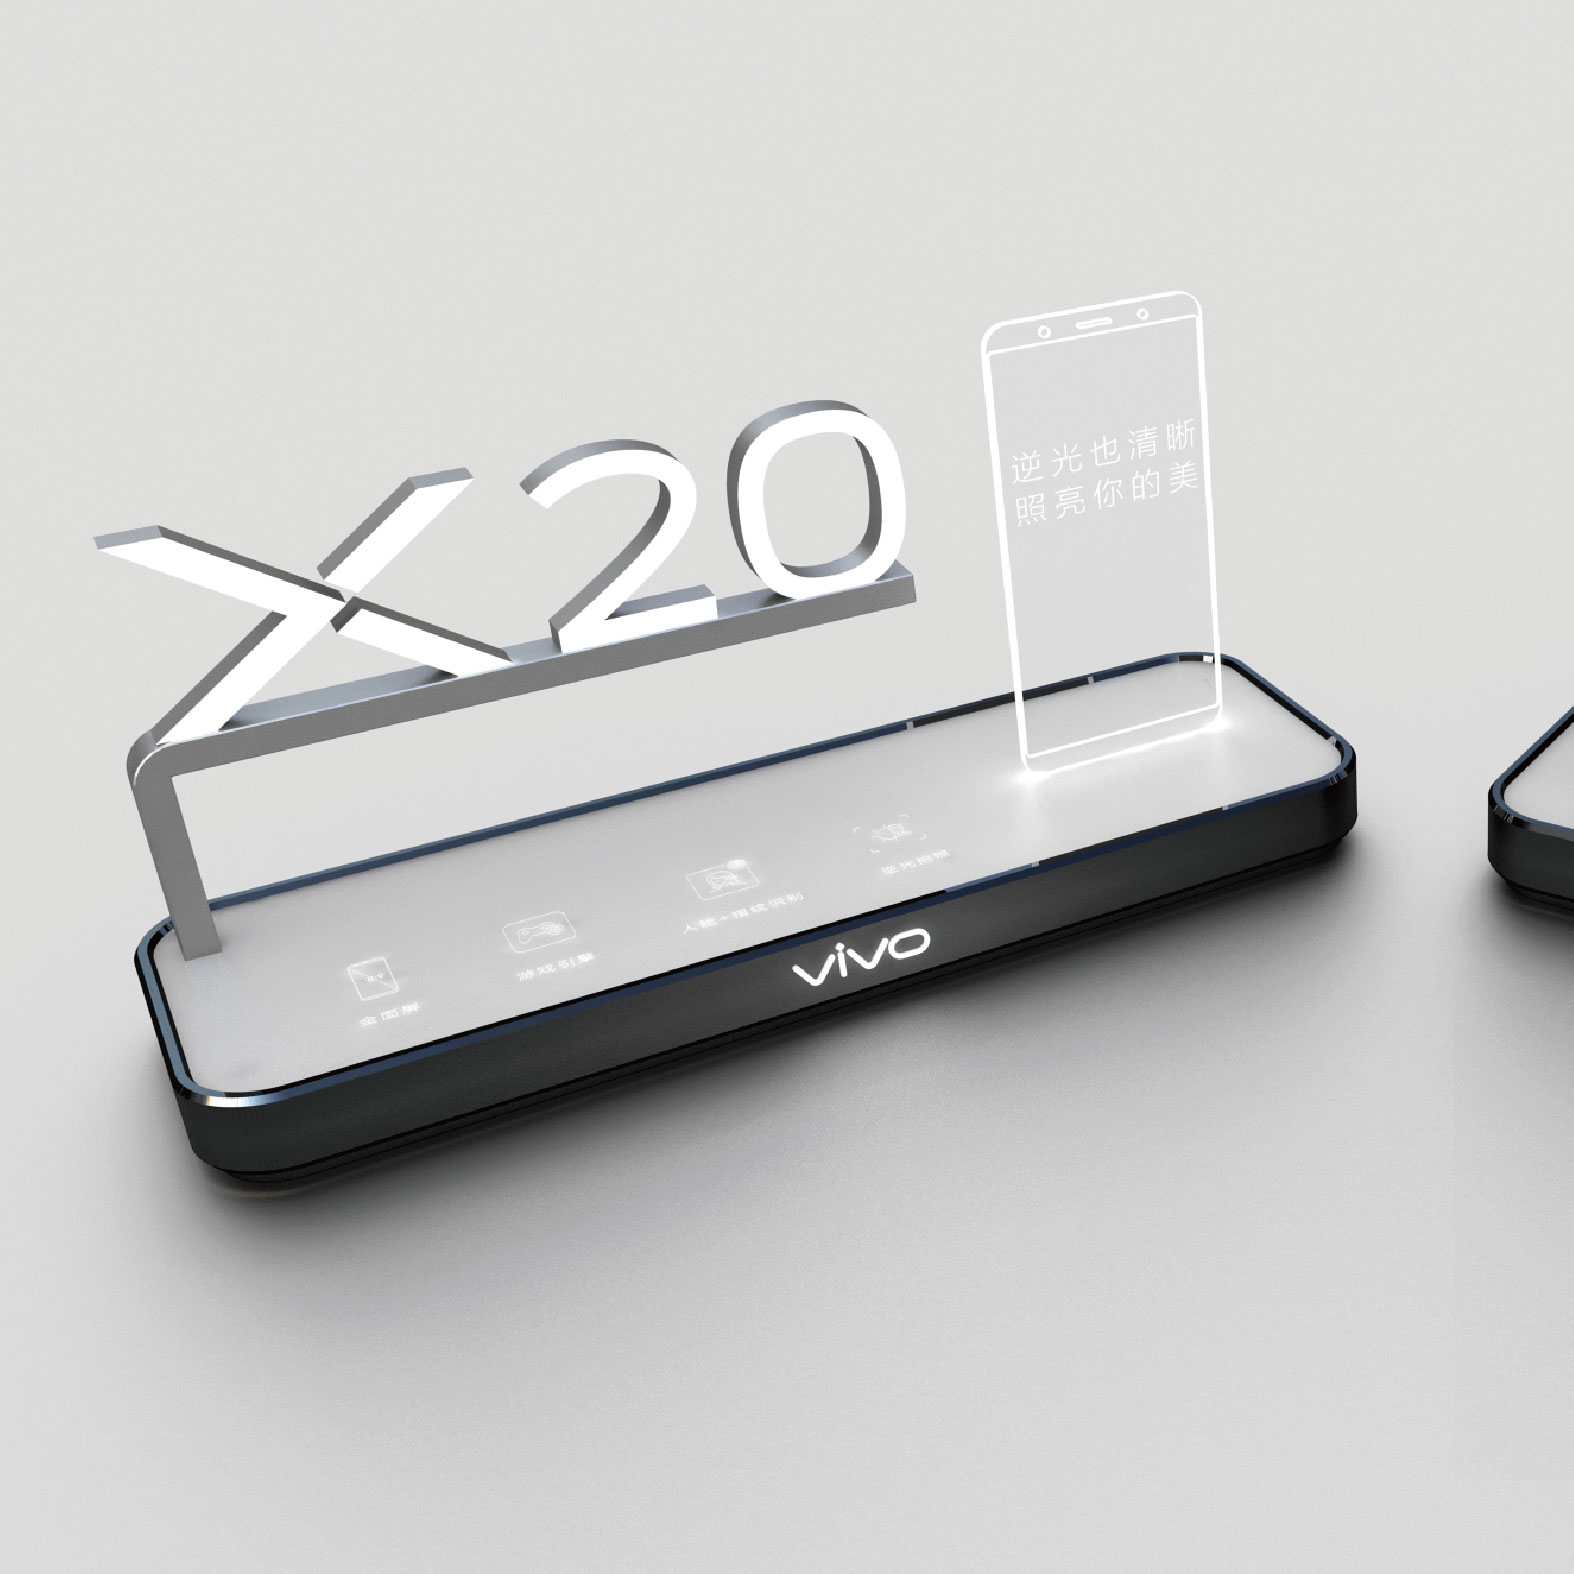 vivo X20 Creative Props